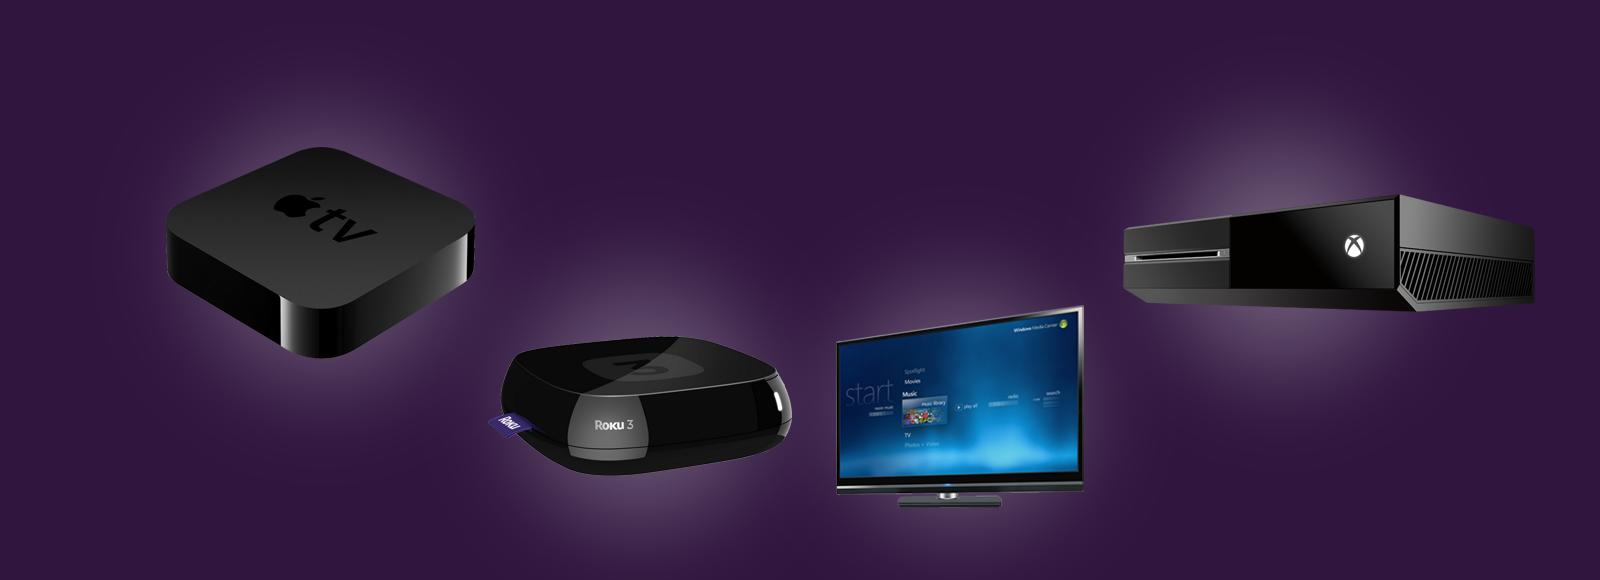 IR Universal Remotes for Apple TV - Xbox One - Roku - Windows Media Center